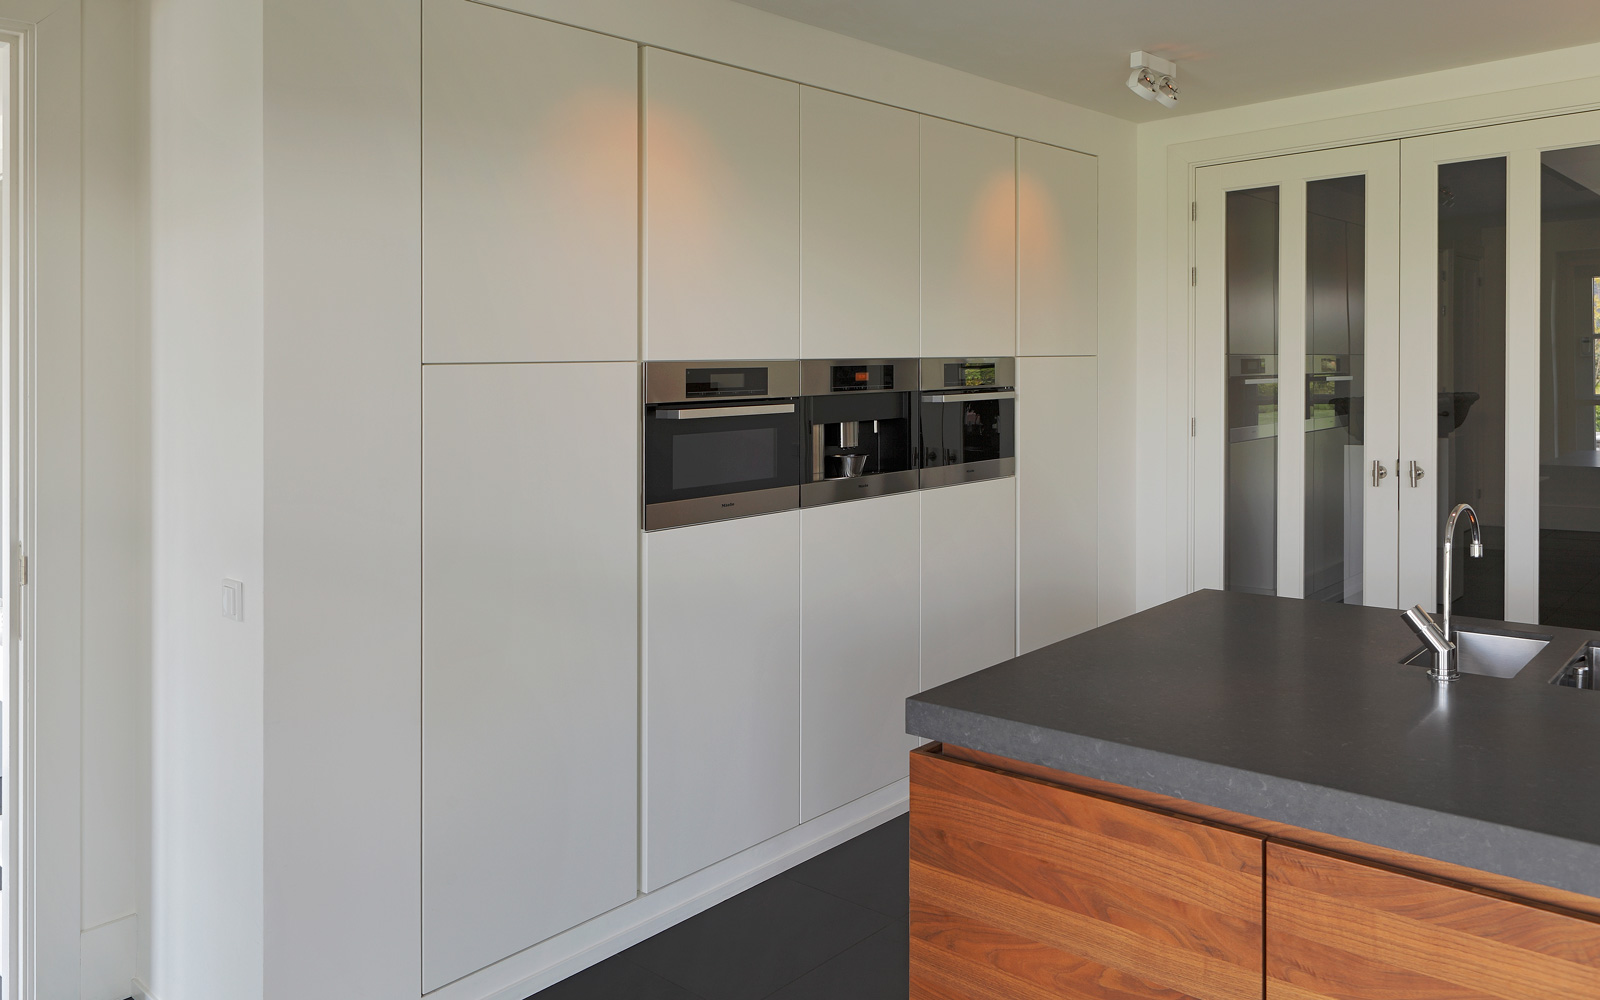 Keuken, Van den Berg keukens en maatmeubilair, matwerk keuken, hout, leefkeuken, lichtinval, ruimte, hedendaags landhuis, Marco Daverveld